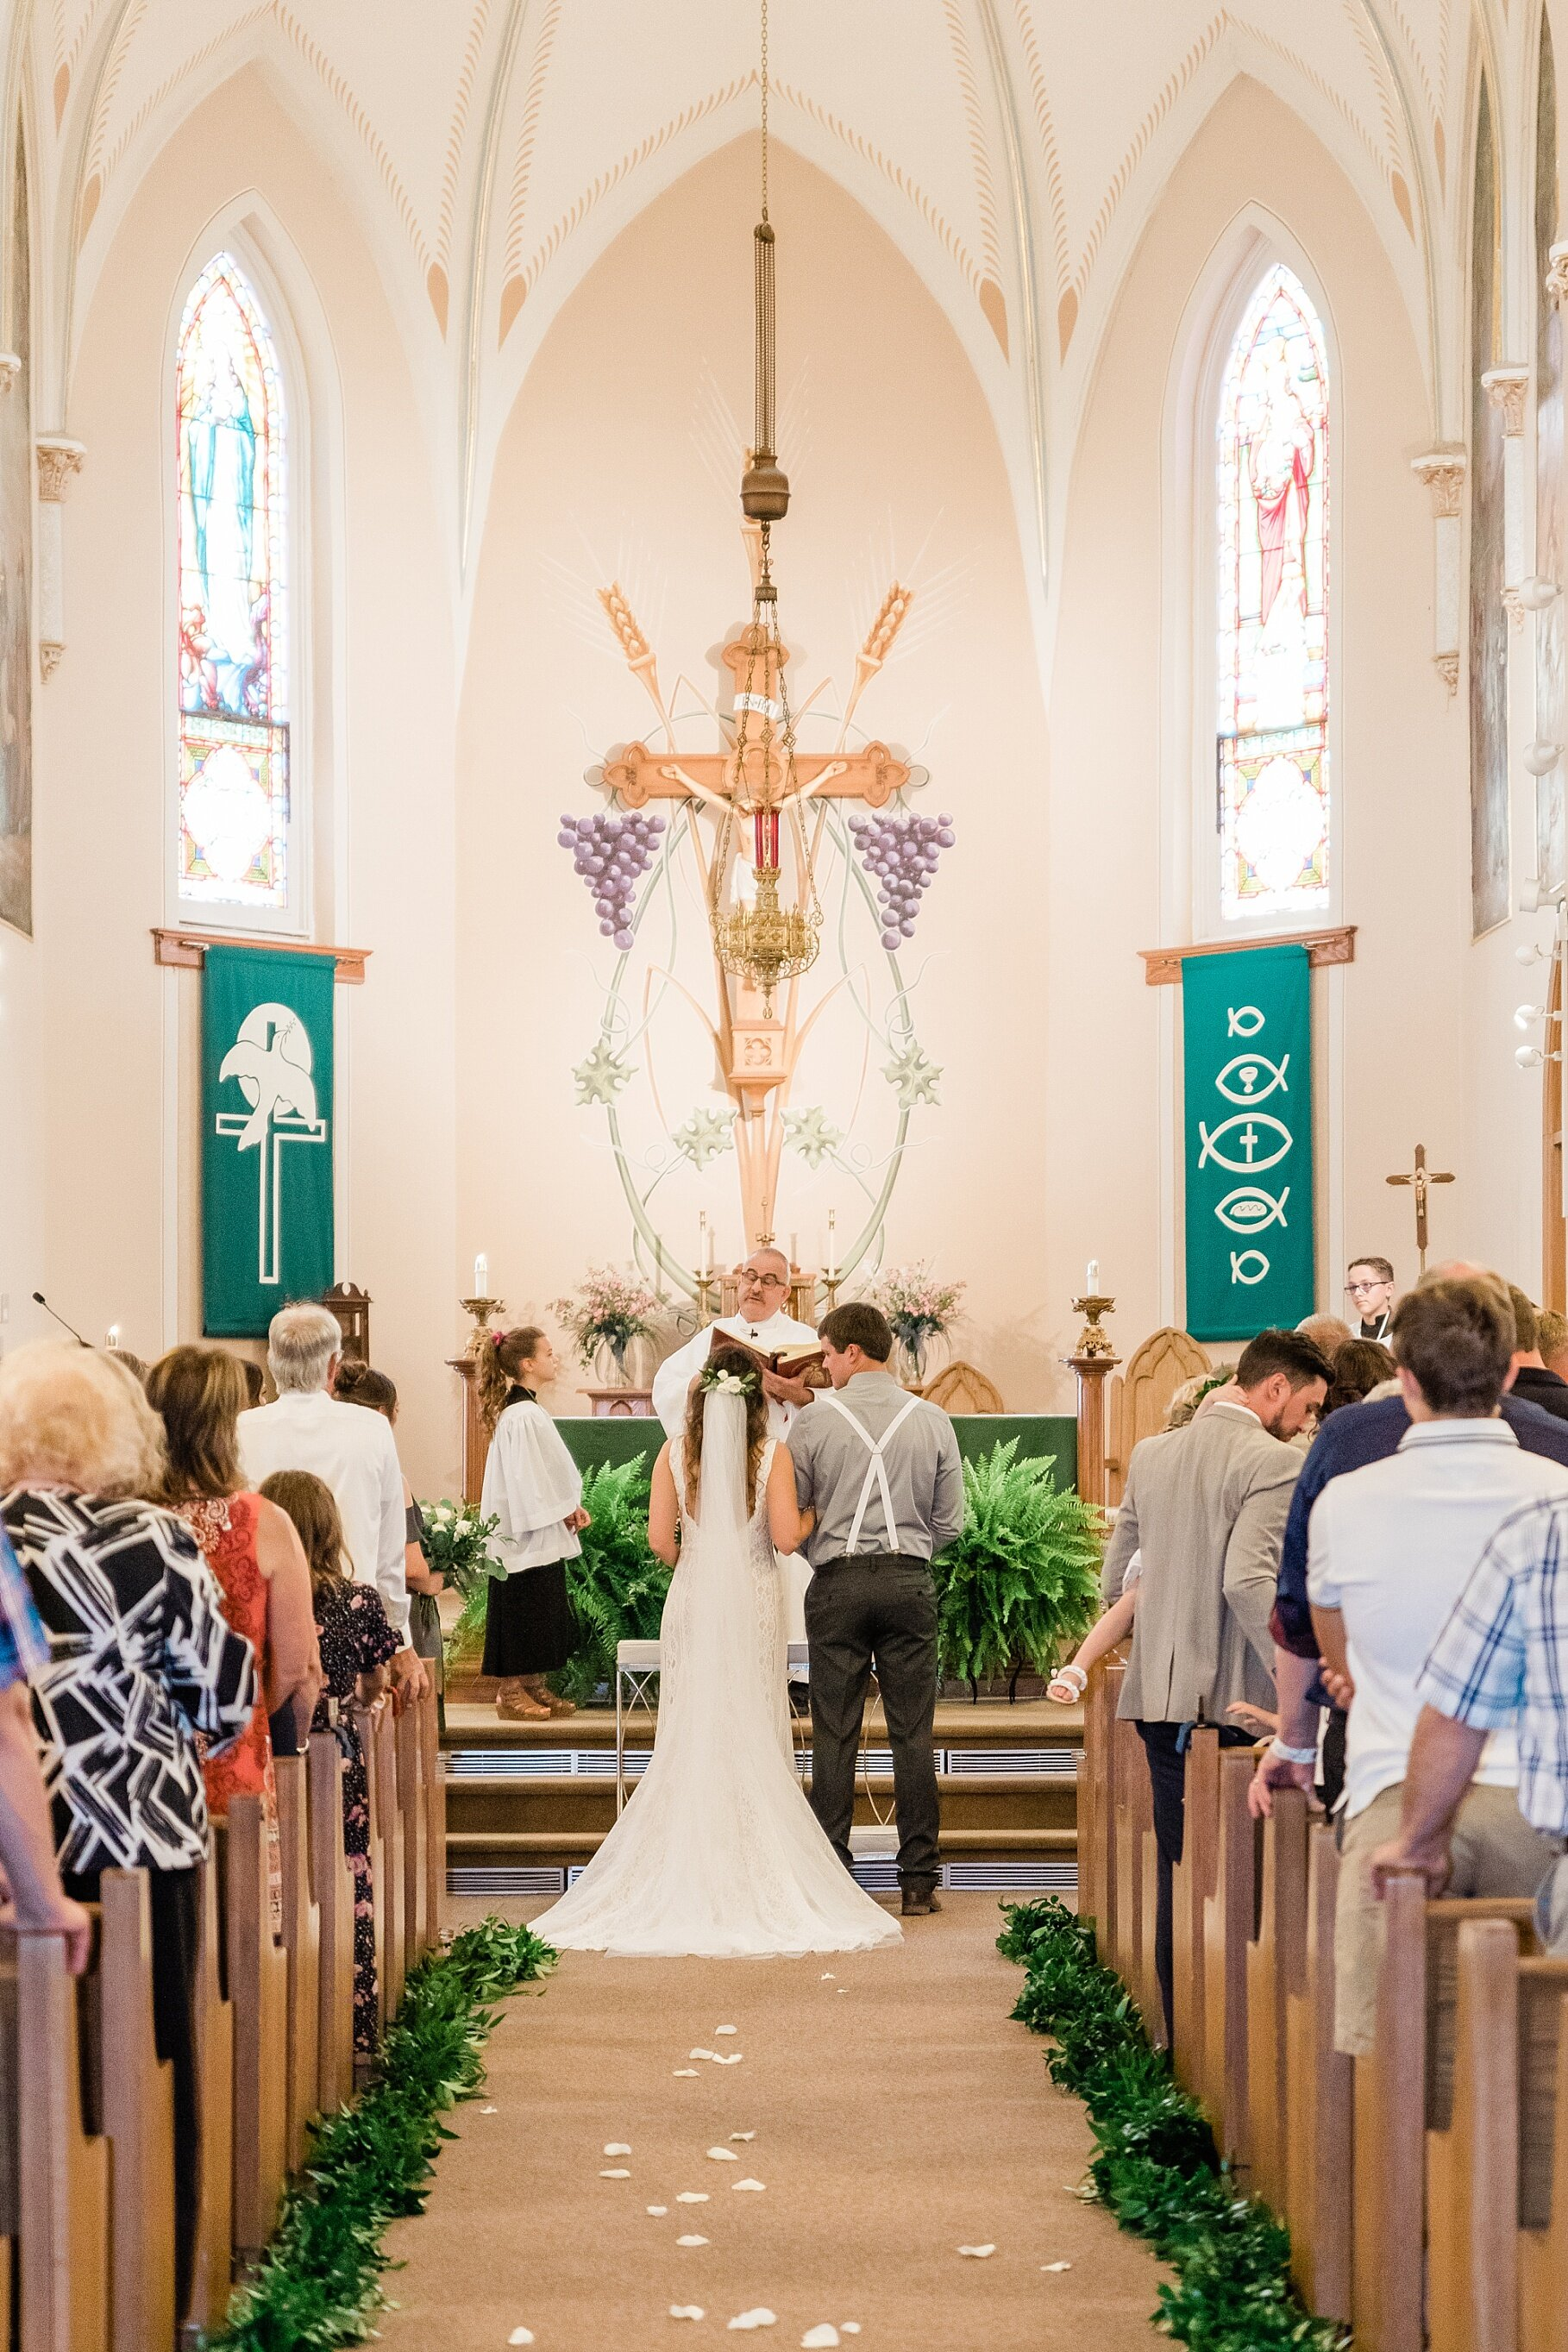 Earth-Toned Wedding by KKP Associate Wedding Photographer and Kelsi Kliethermes Photography Best Columbia Missouri Wedding Photographer_0037.jpg